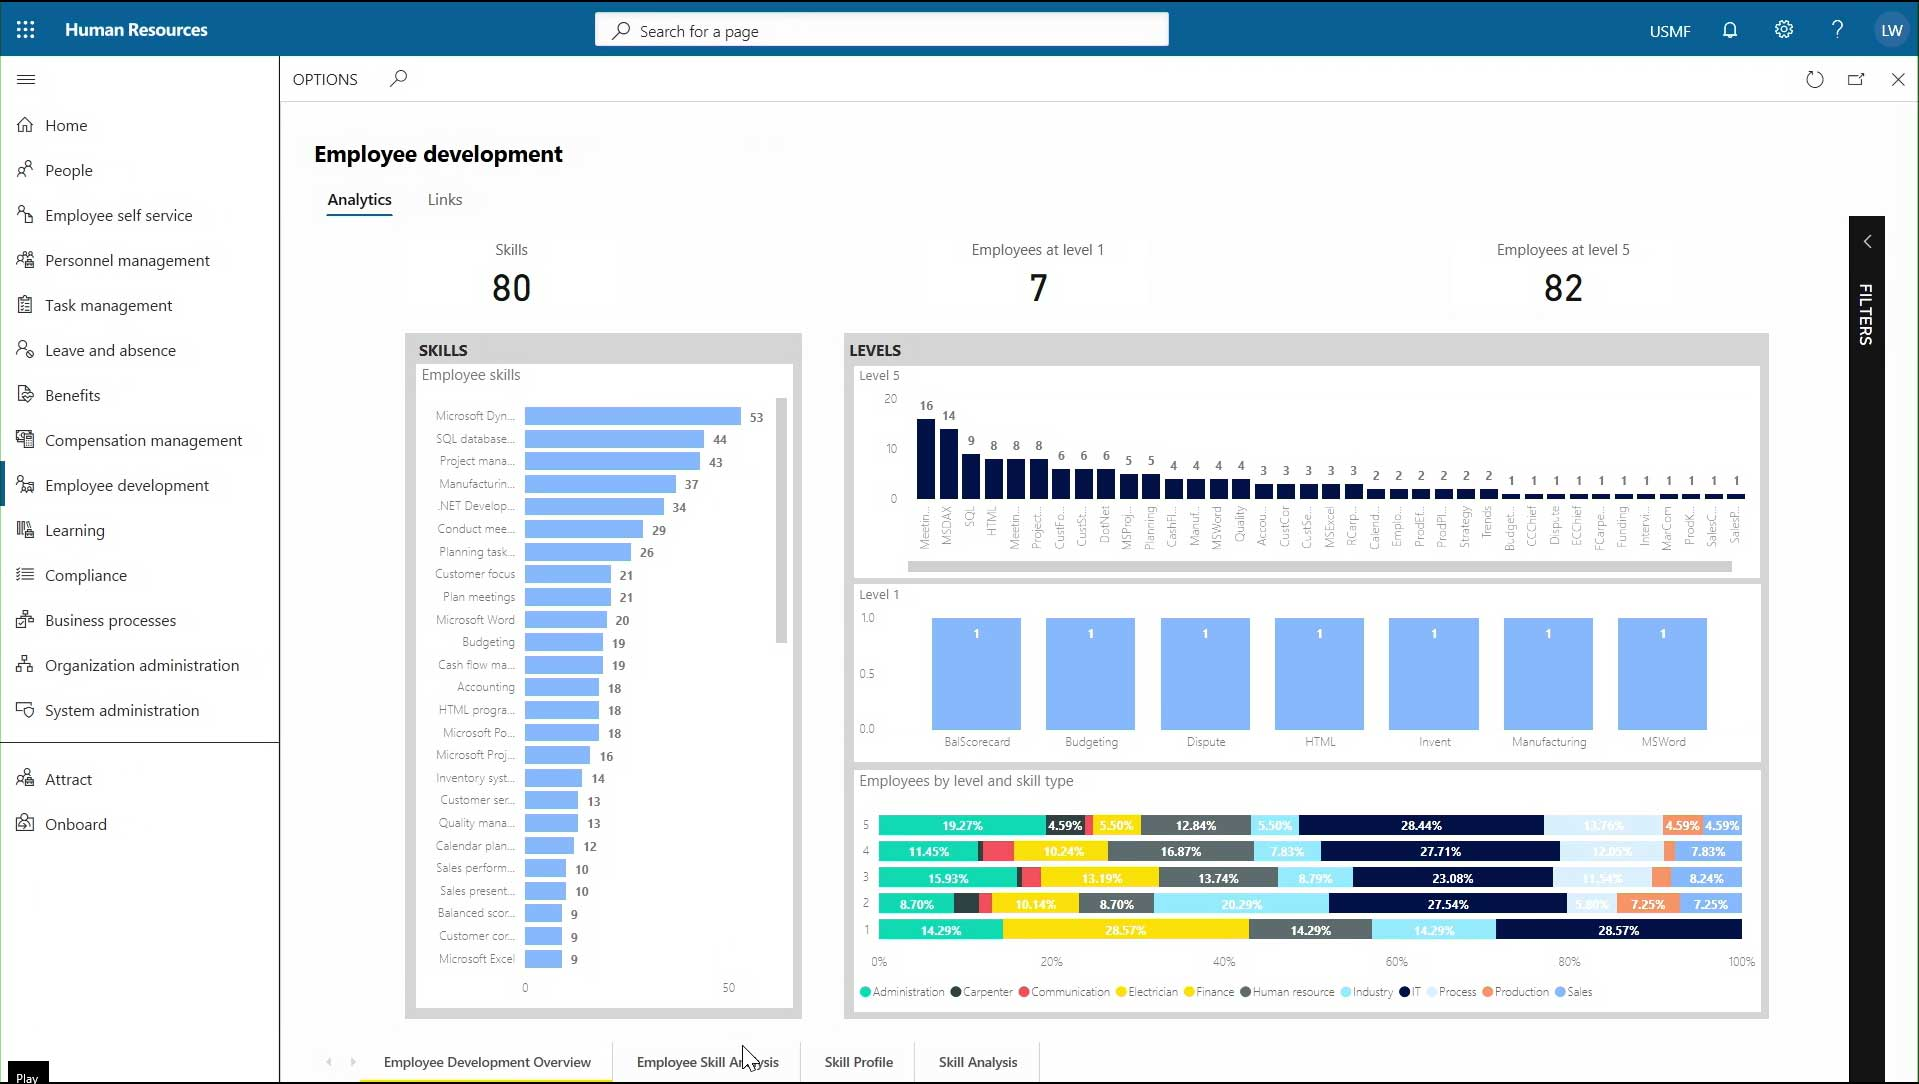 Microsoft Dynamics 365 Human Resources features: Optimize HR policies